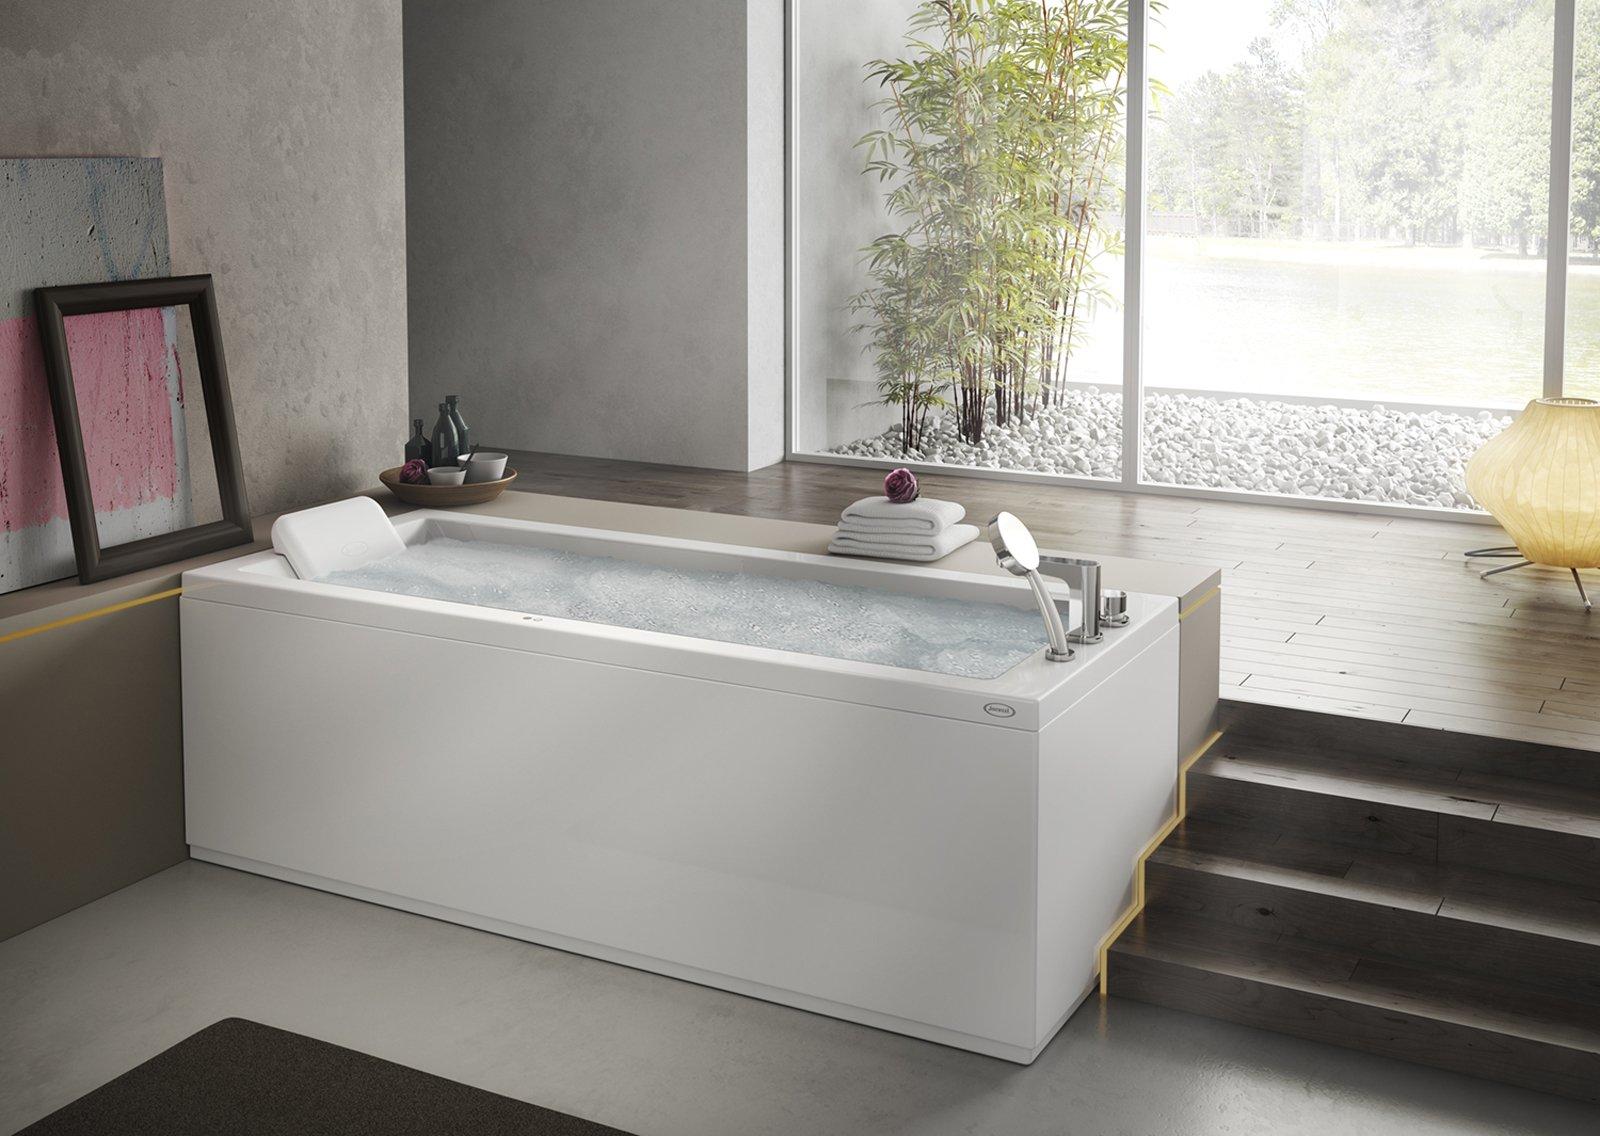 Vasche Da Bagno Angolari Usate : Vasche da bagno low cost a partire da euro cose di casa